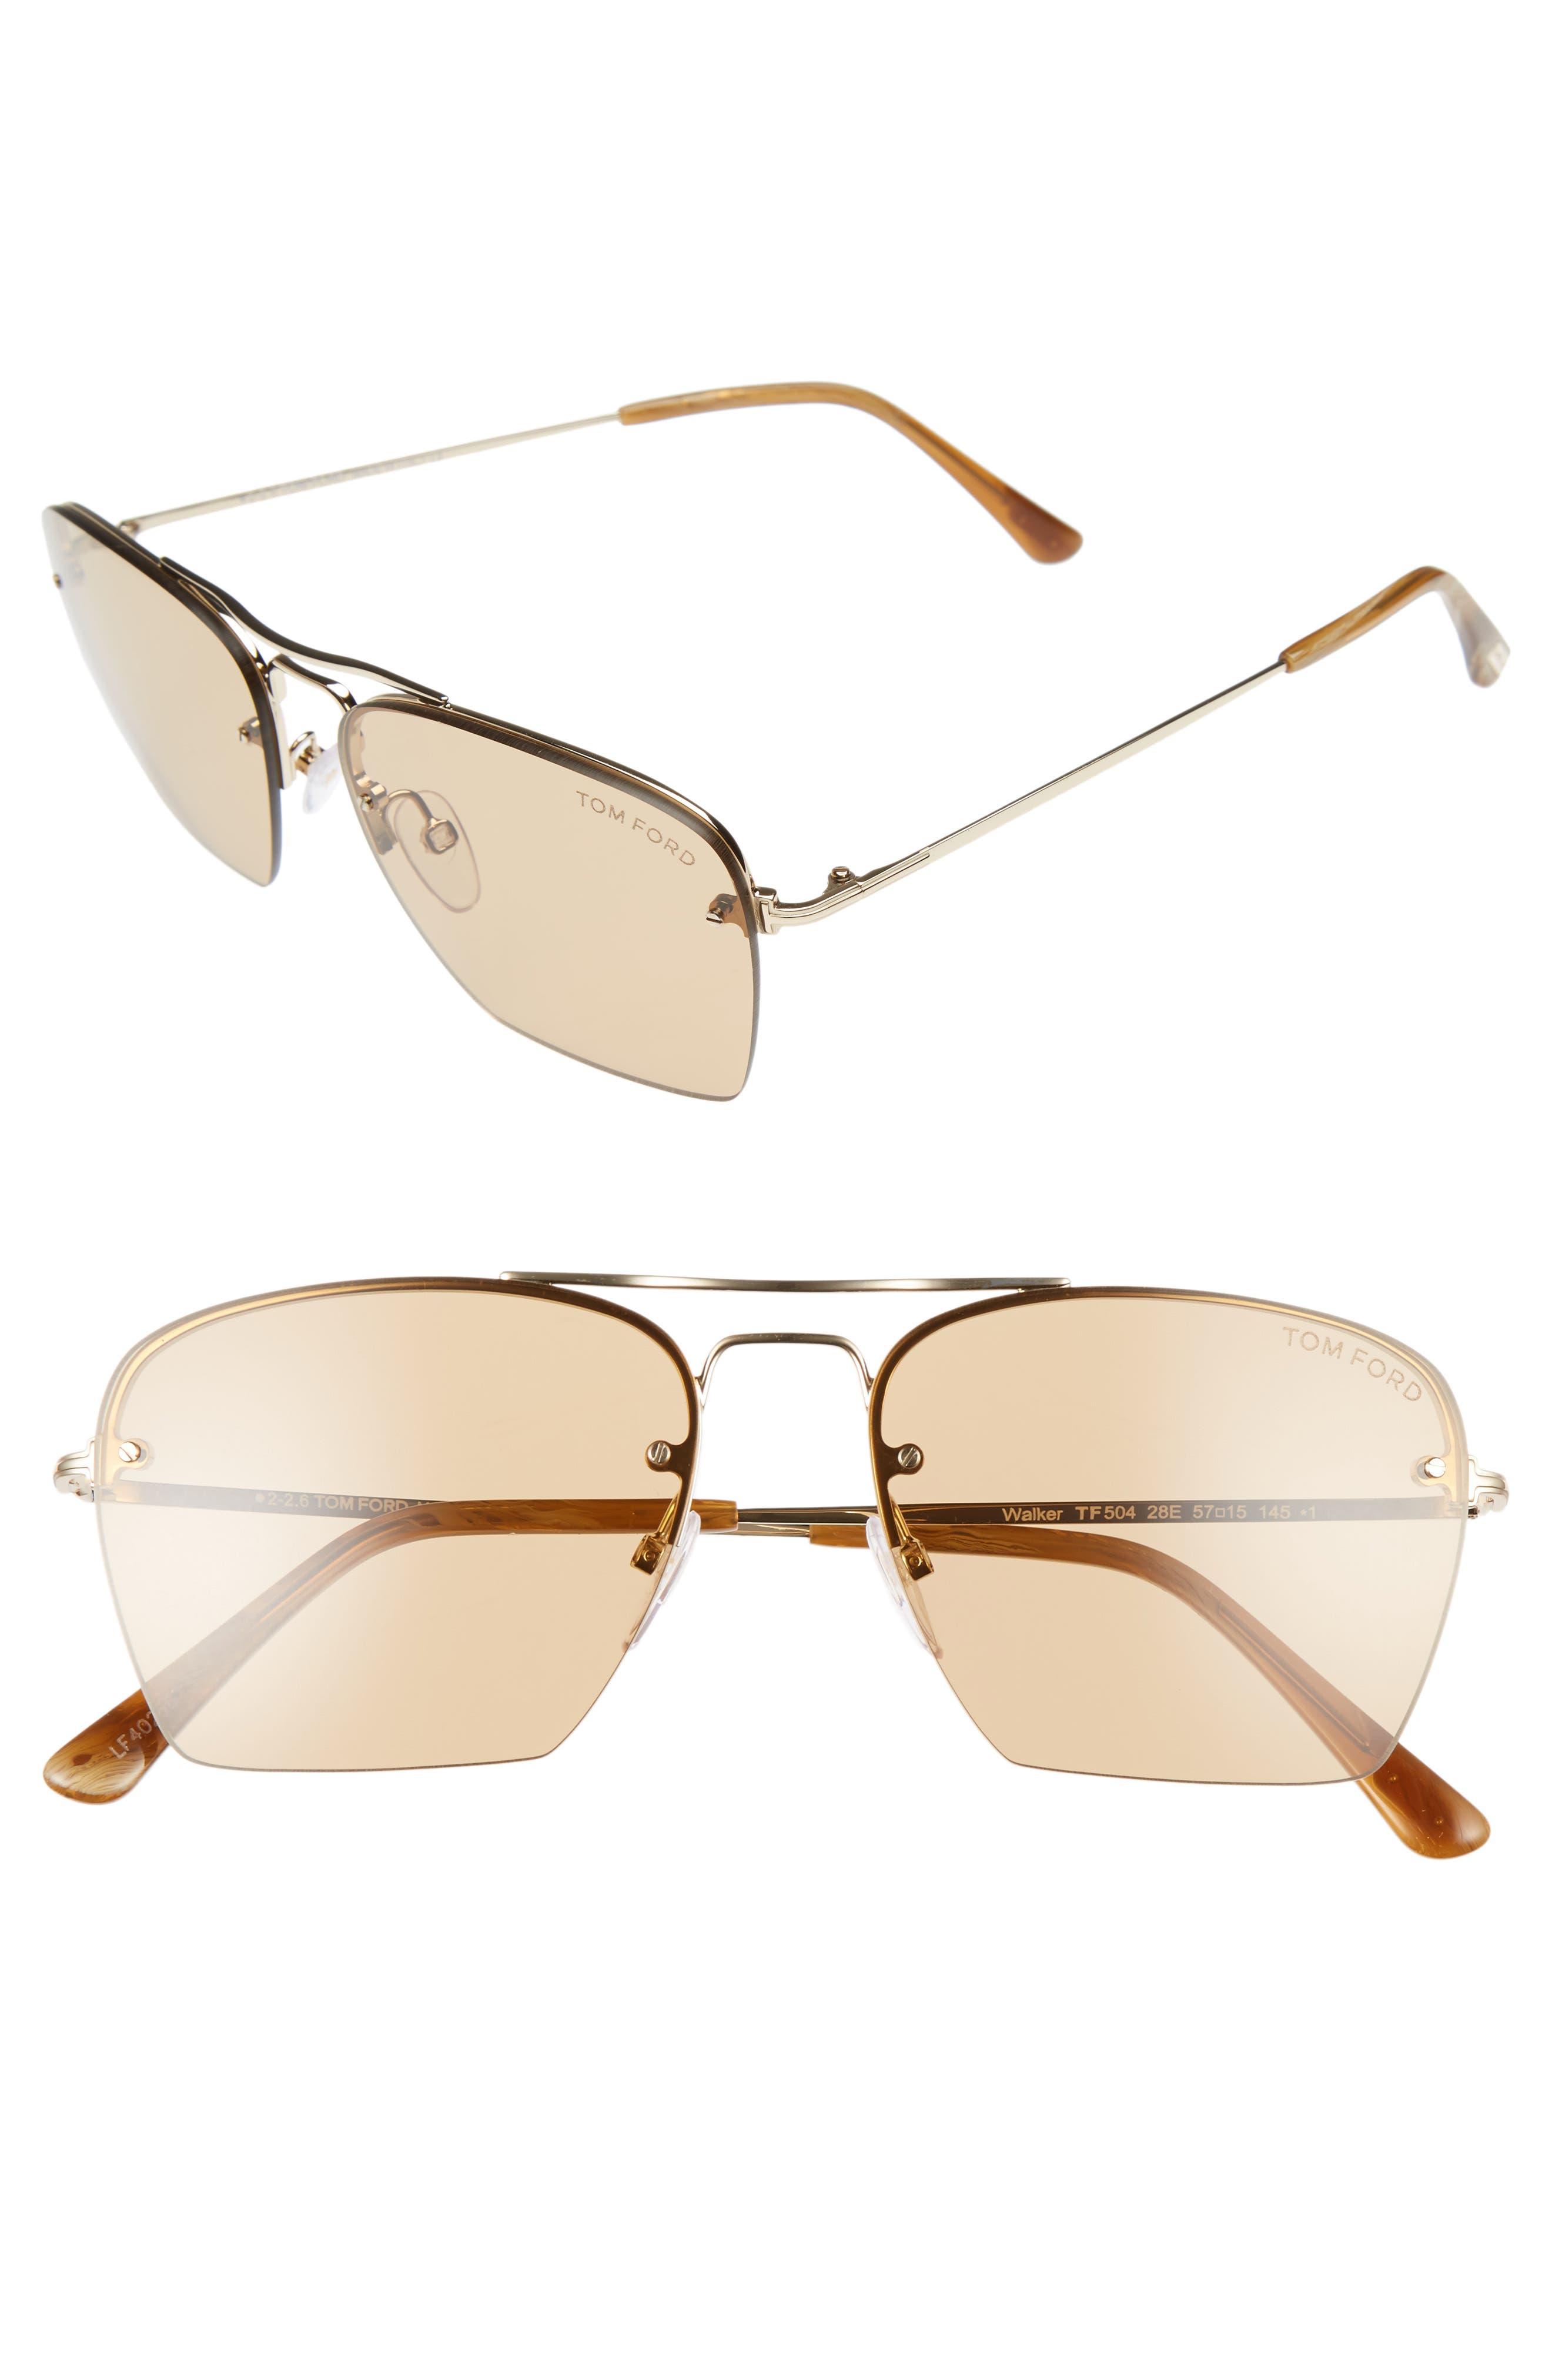 Walker 57mm Semi Rimless Square Sunglasses,                         Main,                         color, Rose Gold/ Brown